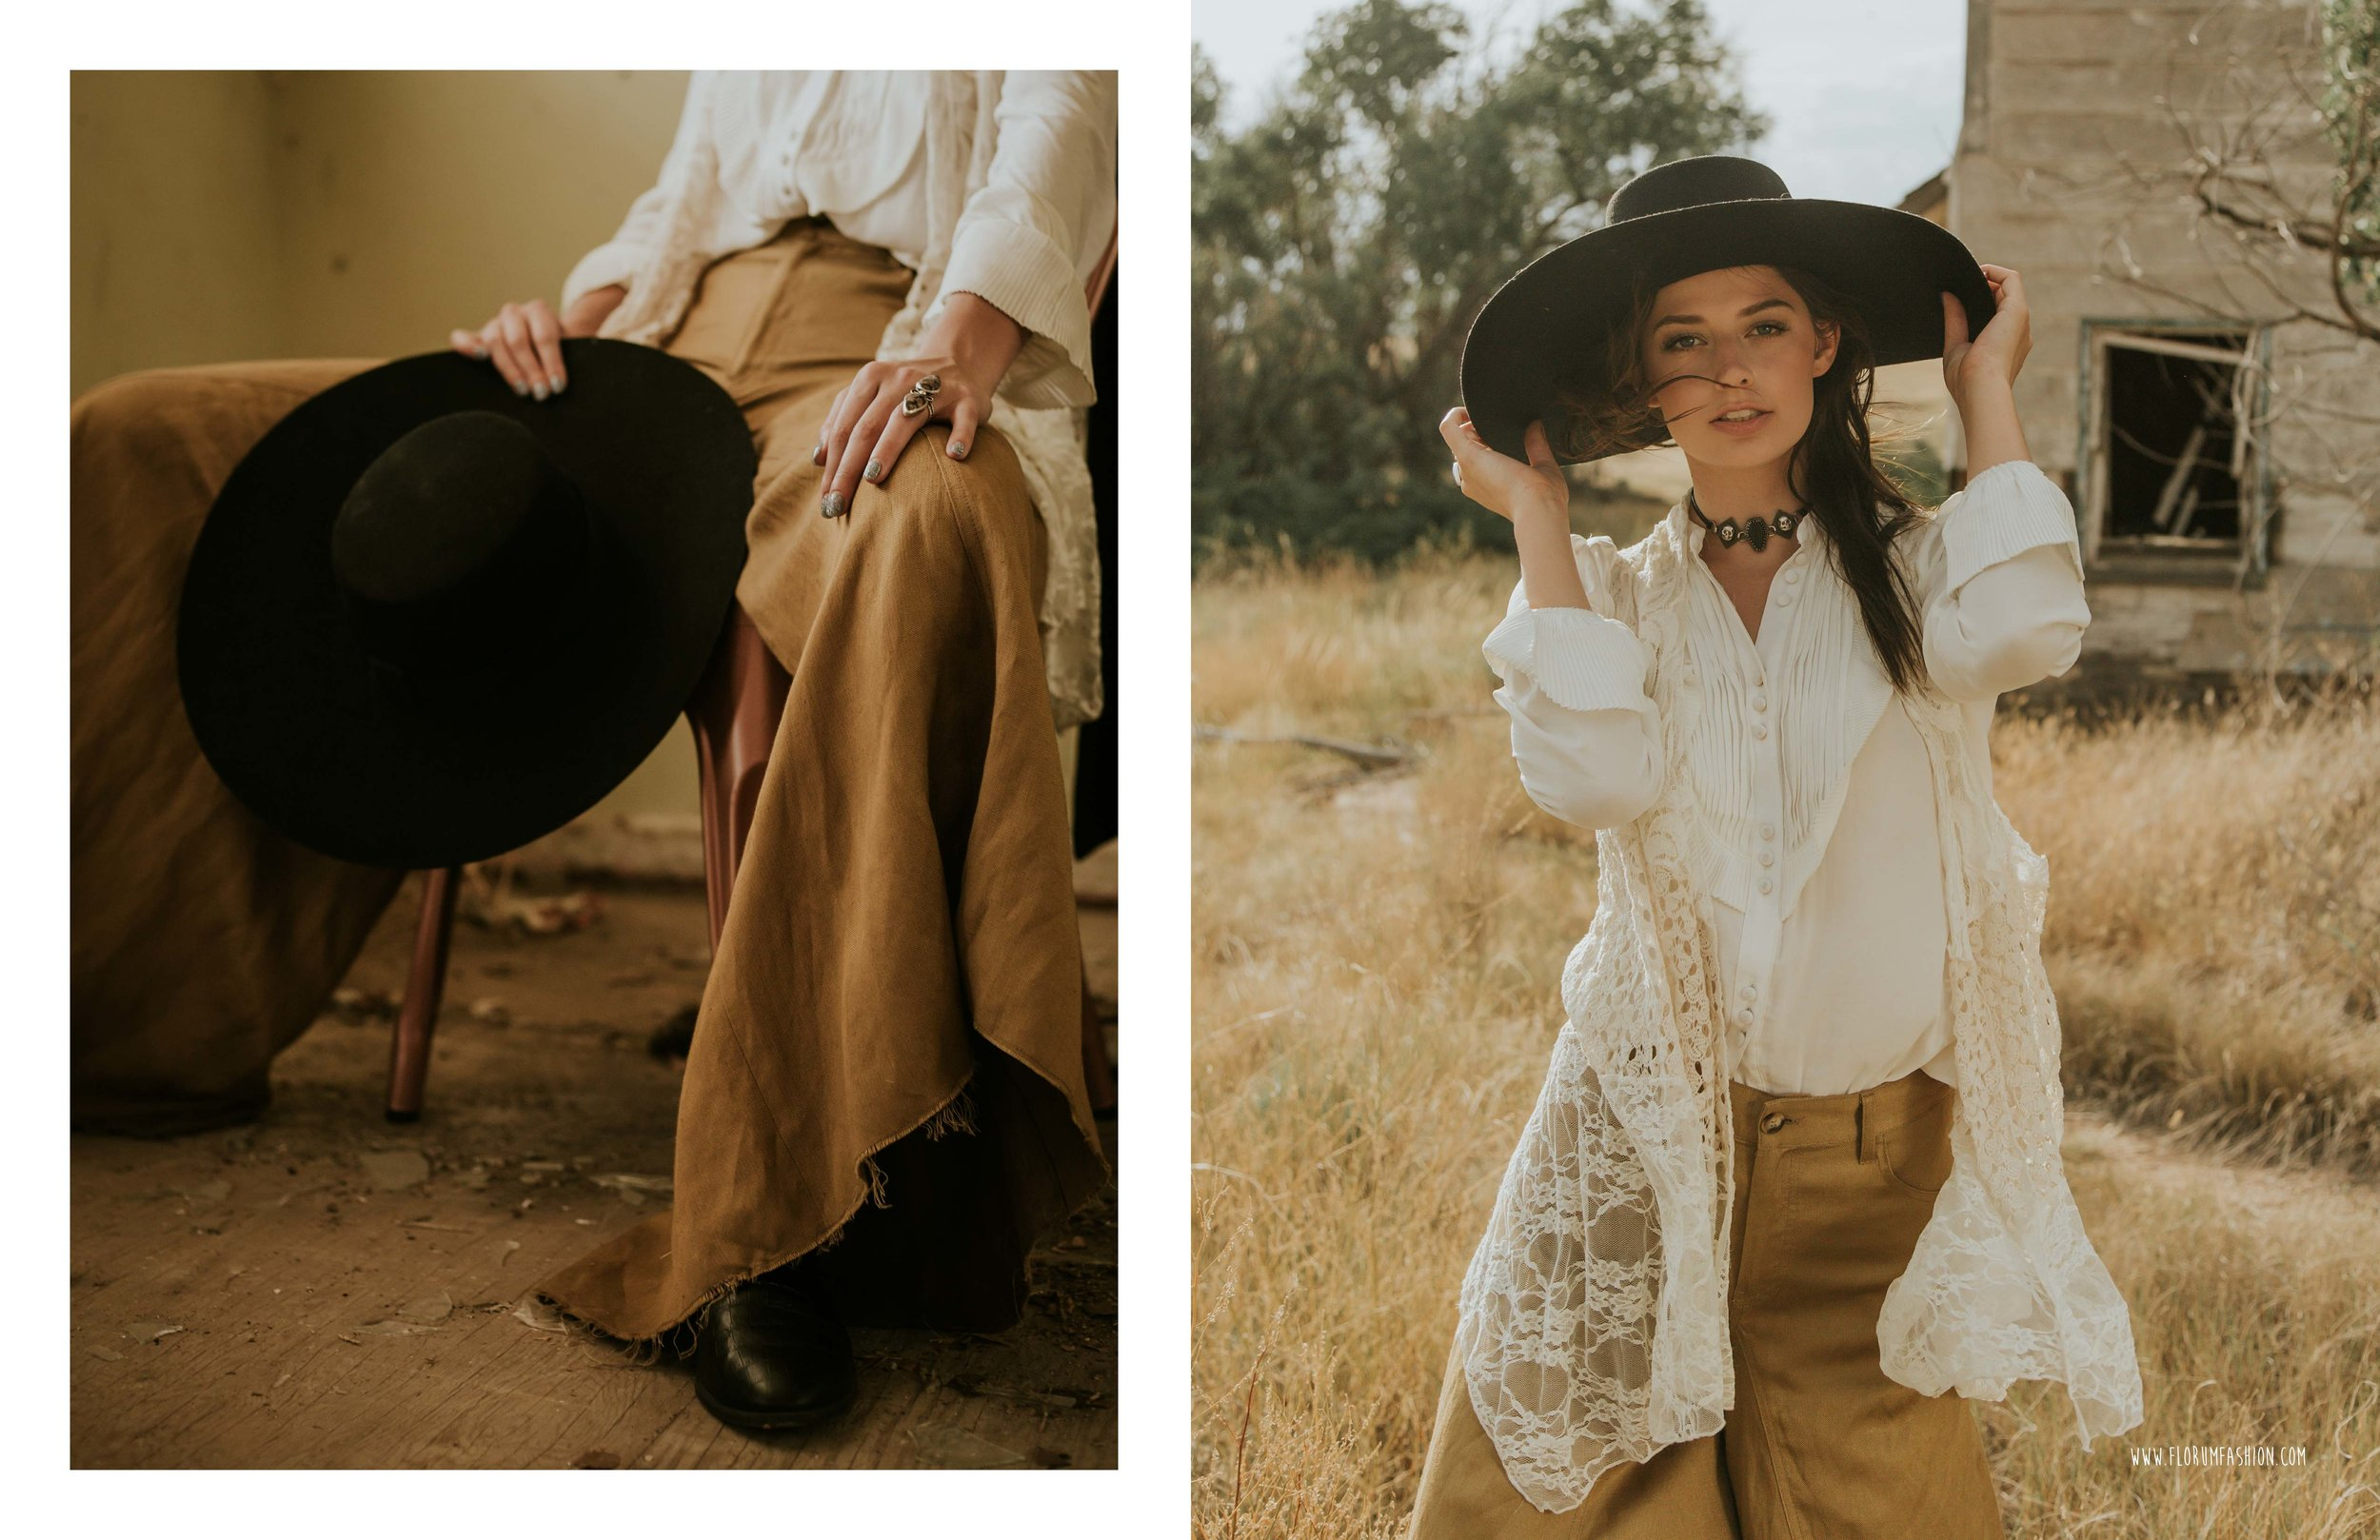 Soeurs  Florum Magazine Ethical Clothing Slow fashion Movement Ladd Forde - Wardrobe Stylist Hannah Moon - Meg Chenoweth Wilhelmina Denver - Danna Denson NXT Model - Sacred Rites Jewelry - Shop Goldyn Denver